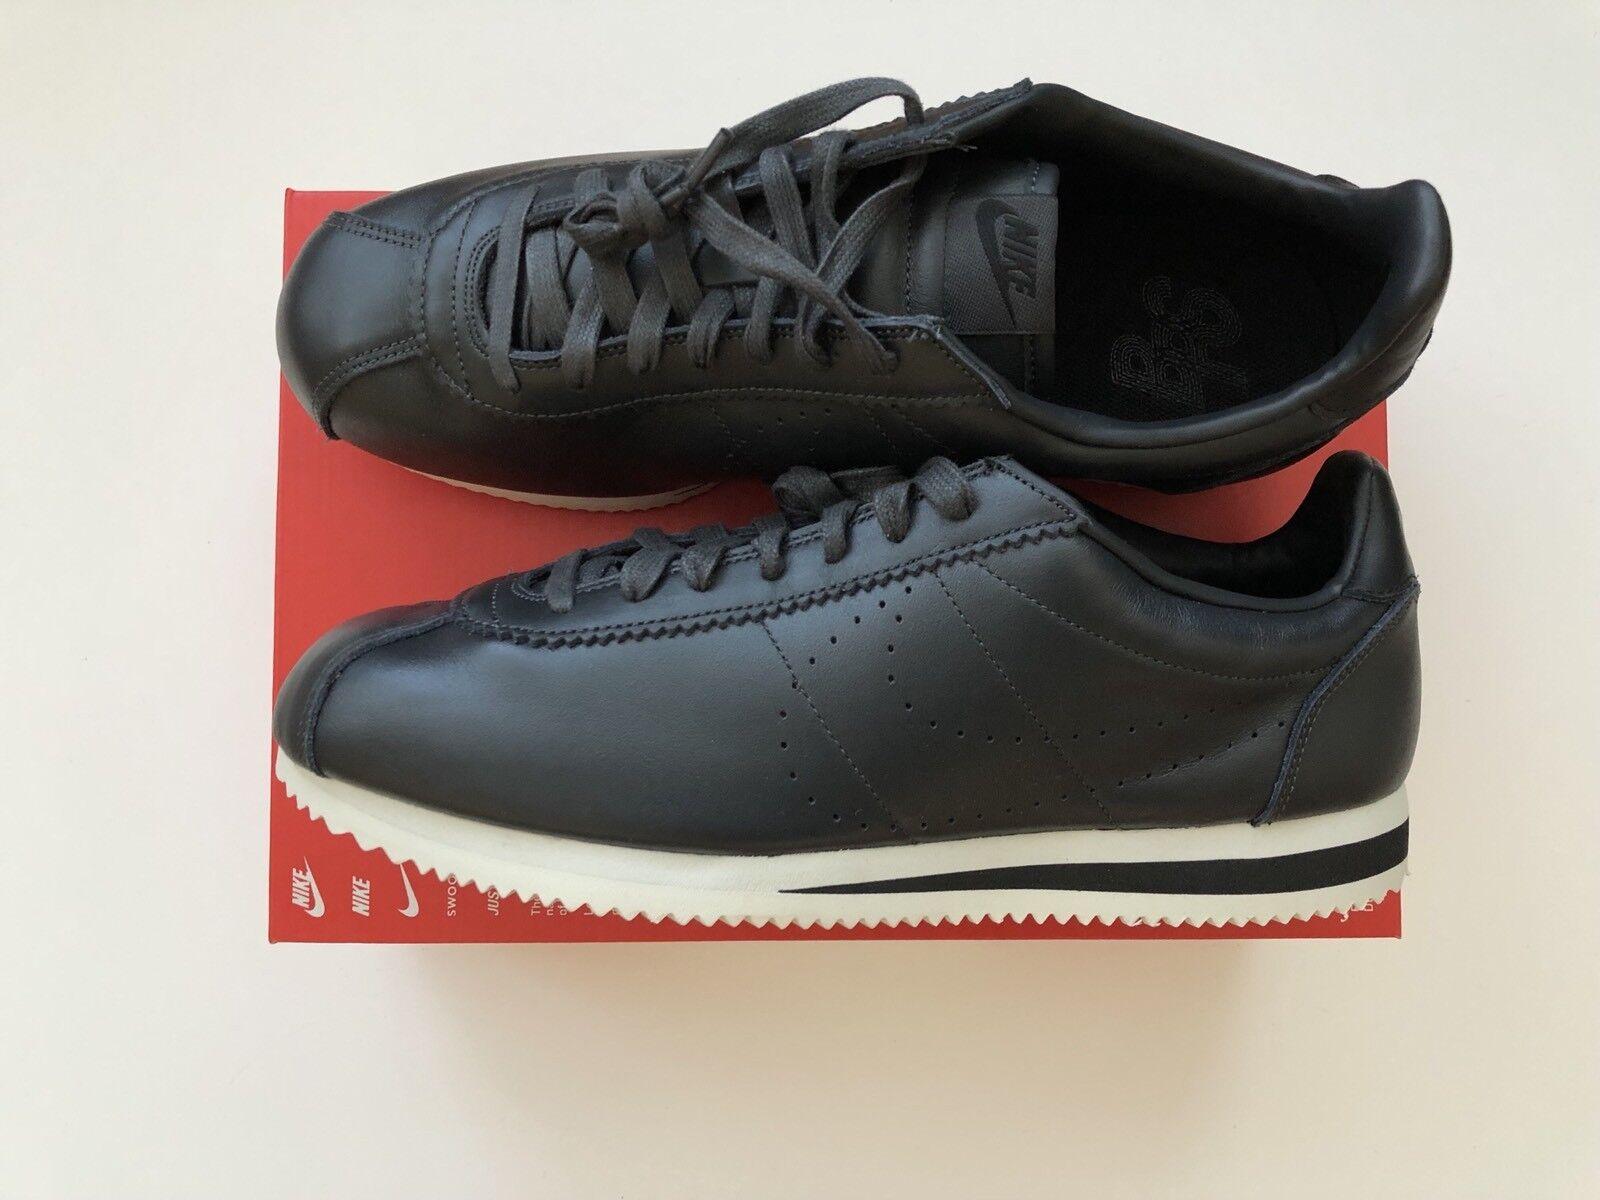 Nike Classic Cortez Premium Leather Shoes Trainers Size UK 11